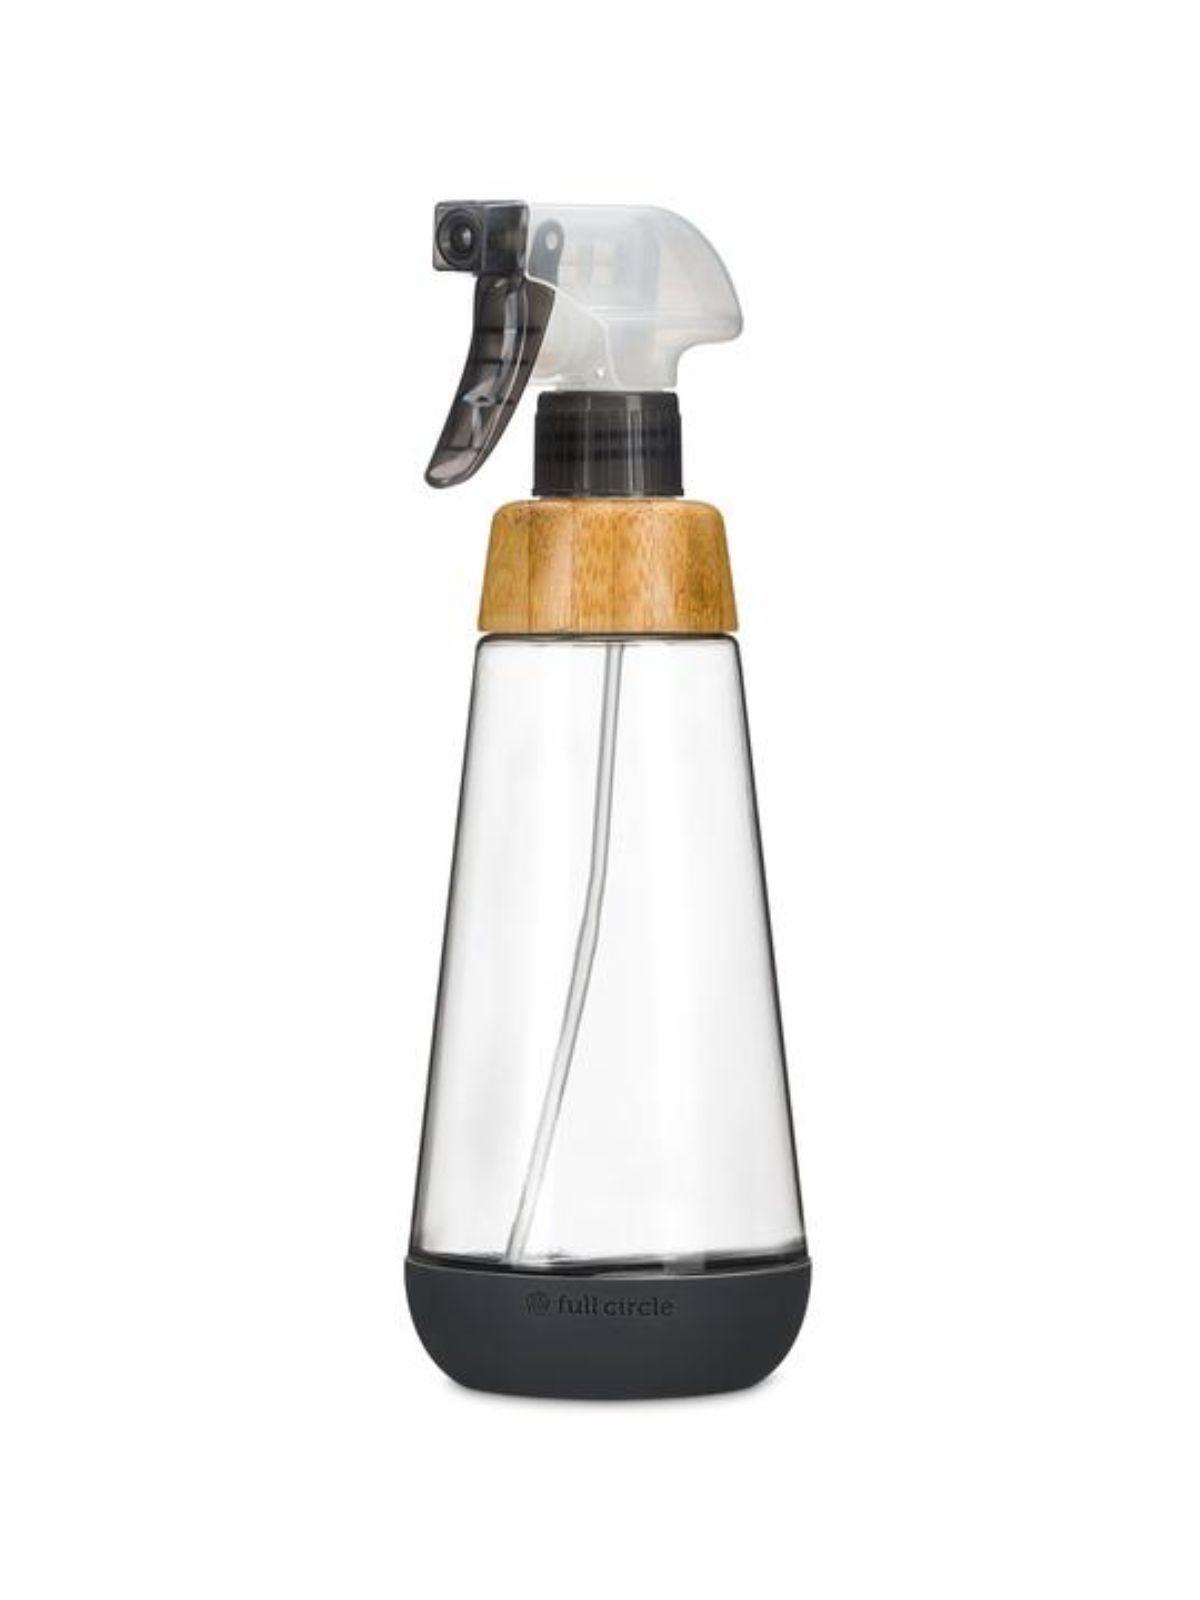 16 oz Refillable Glass Spray Bottle